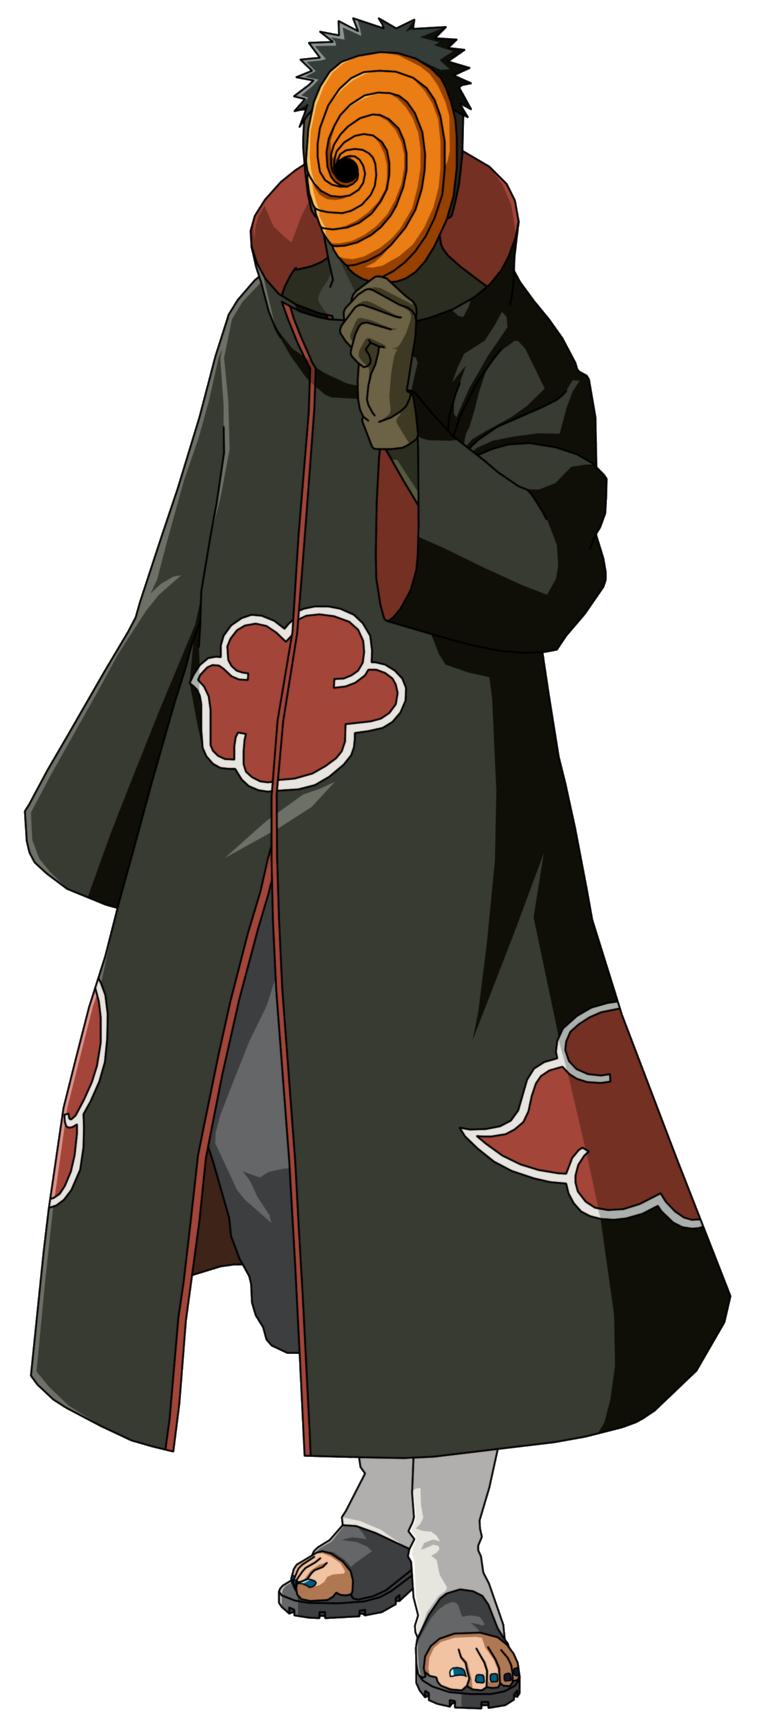 Obito Uchiha vs Natsu Dragneel